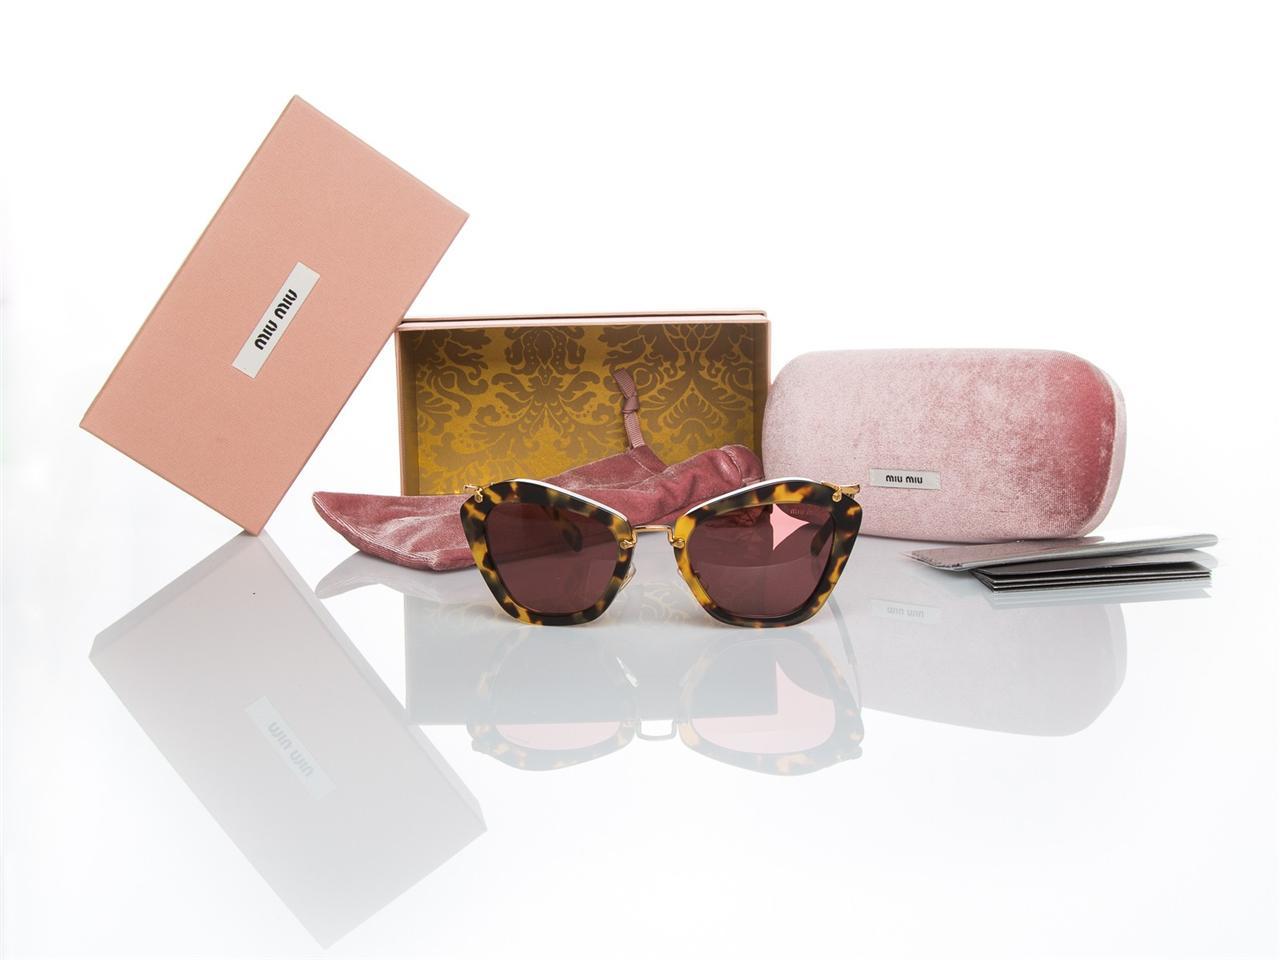 7d9f43334f9c Miu Miu Sunglasses Sale Ebay